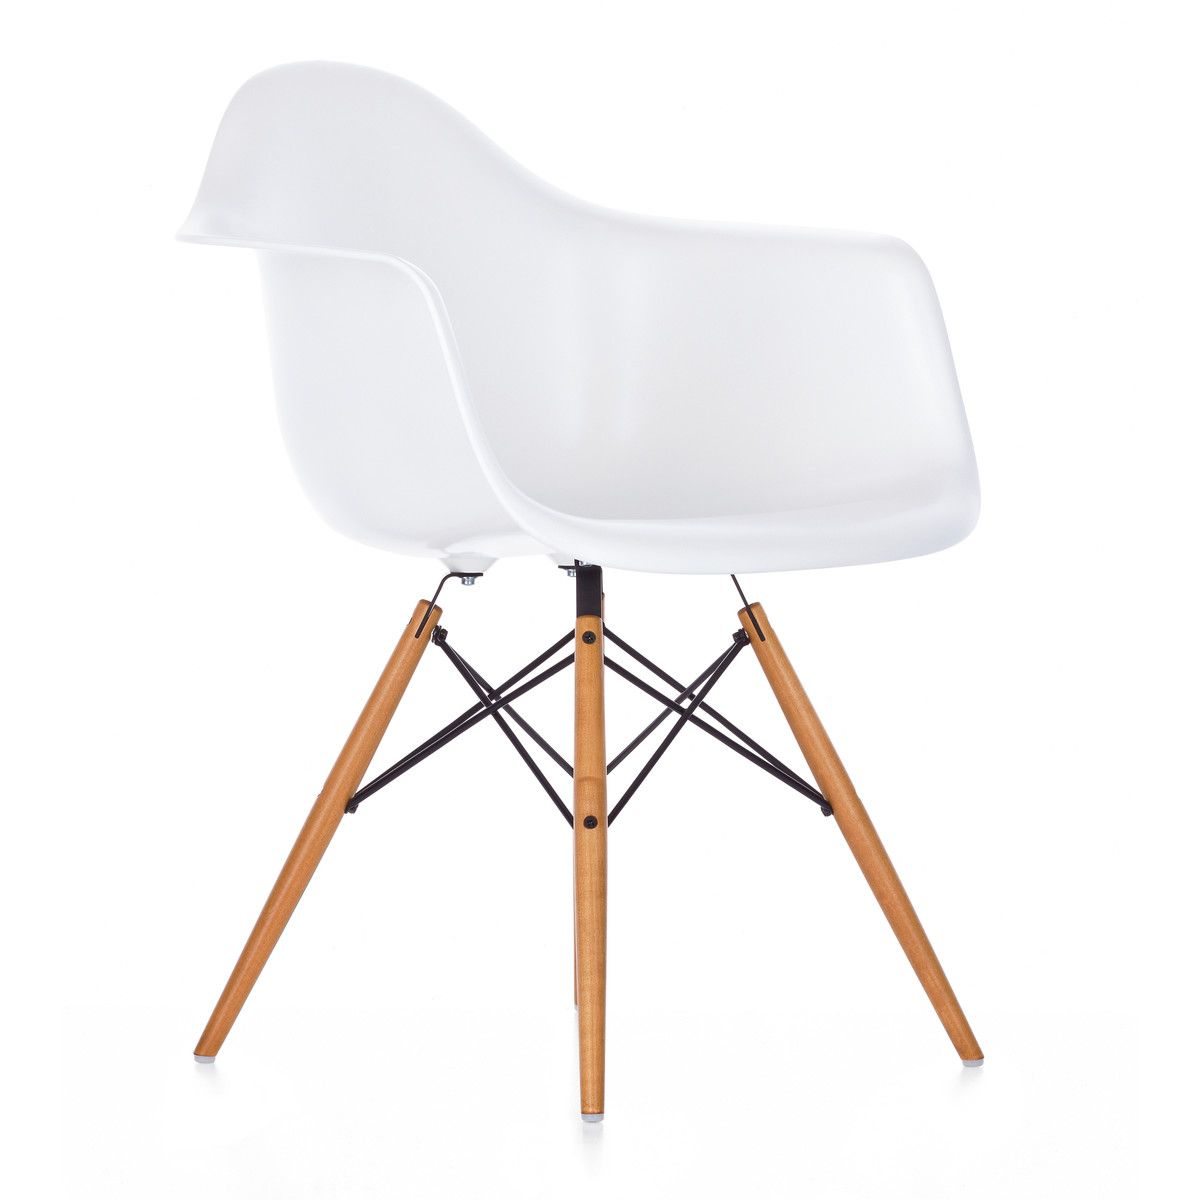 Eames plastic chair wooden legs - Vitra Eames Plastic Armchair Daw Ahorn Gelblich Wei Filzgleiter